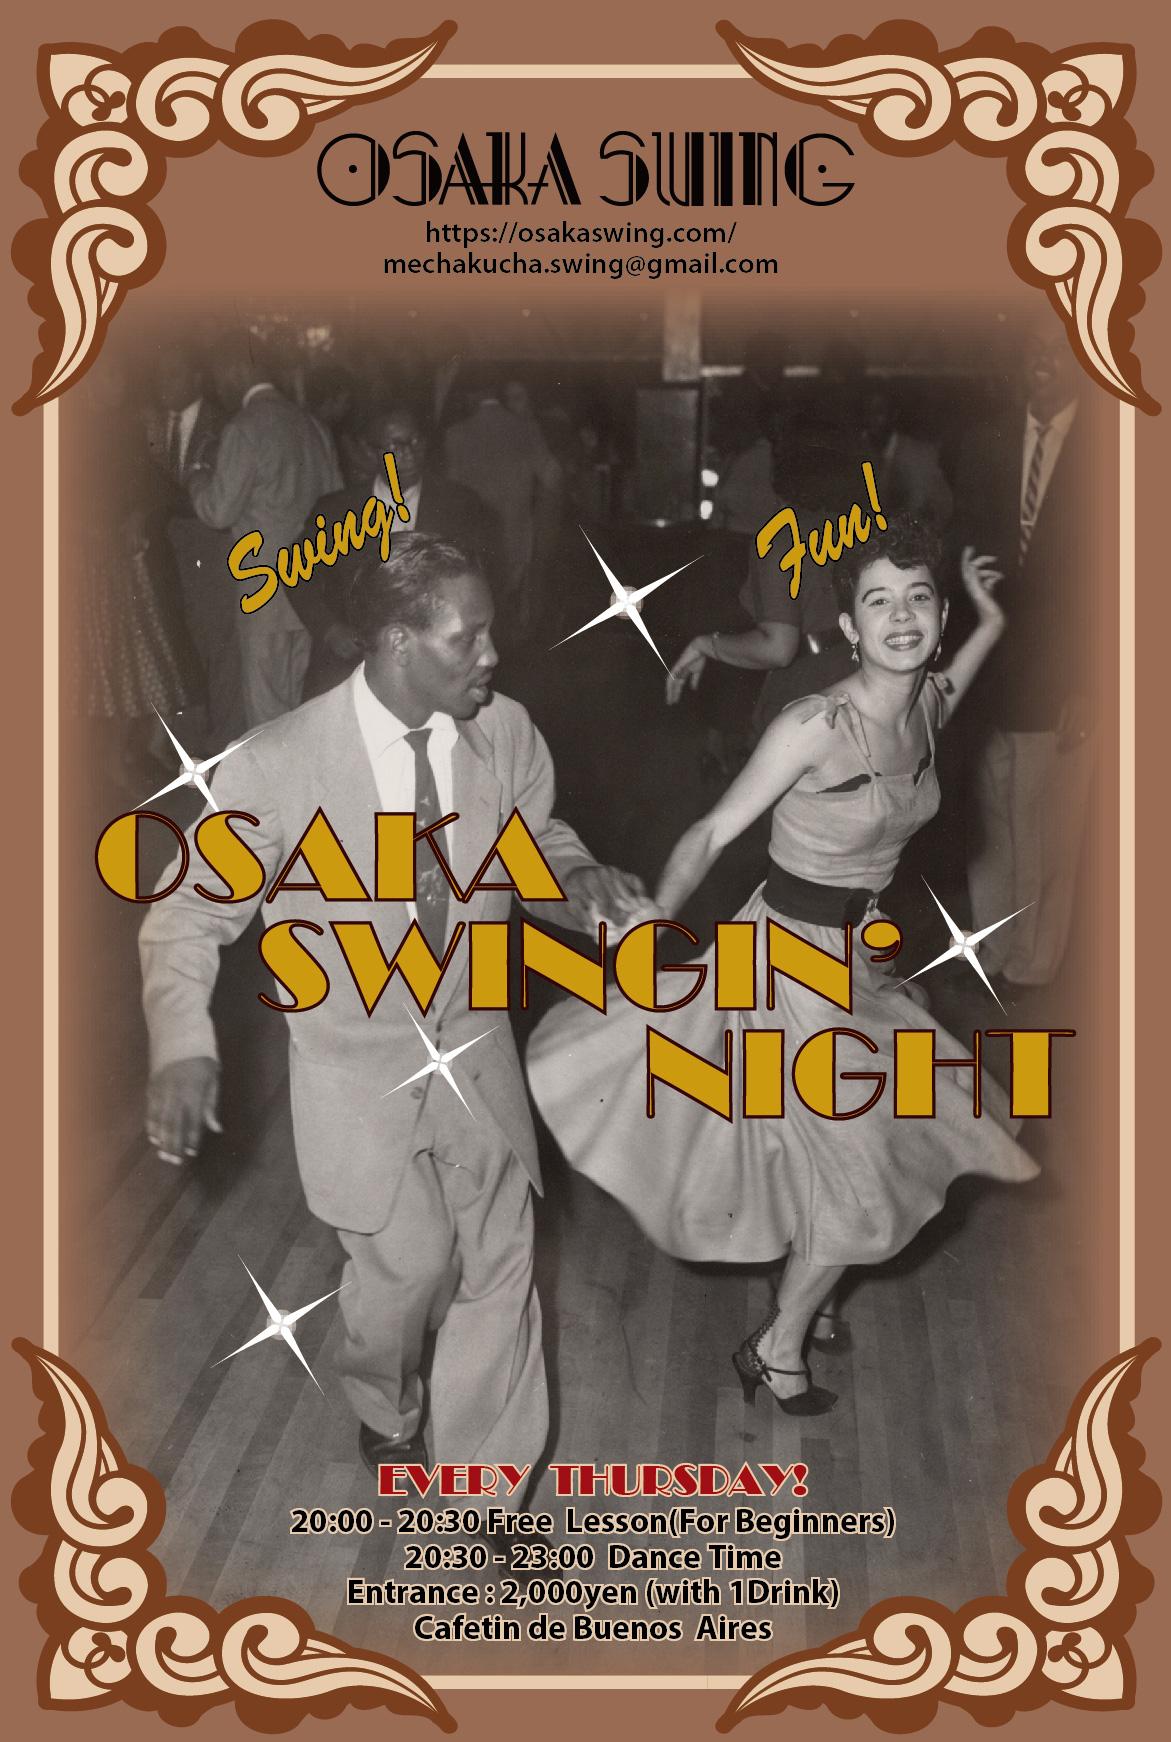 OSAKA SWINGIN' NIGHT @ Cafetin de Buenos Aires